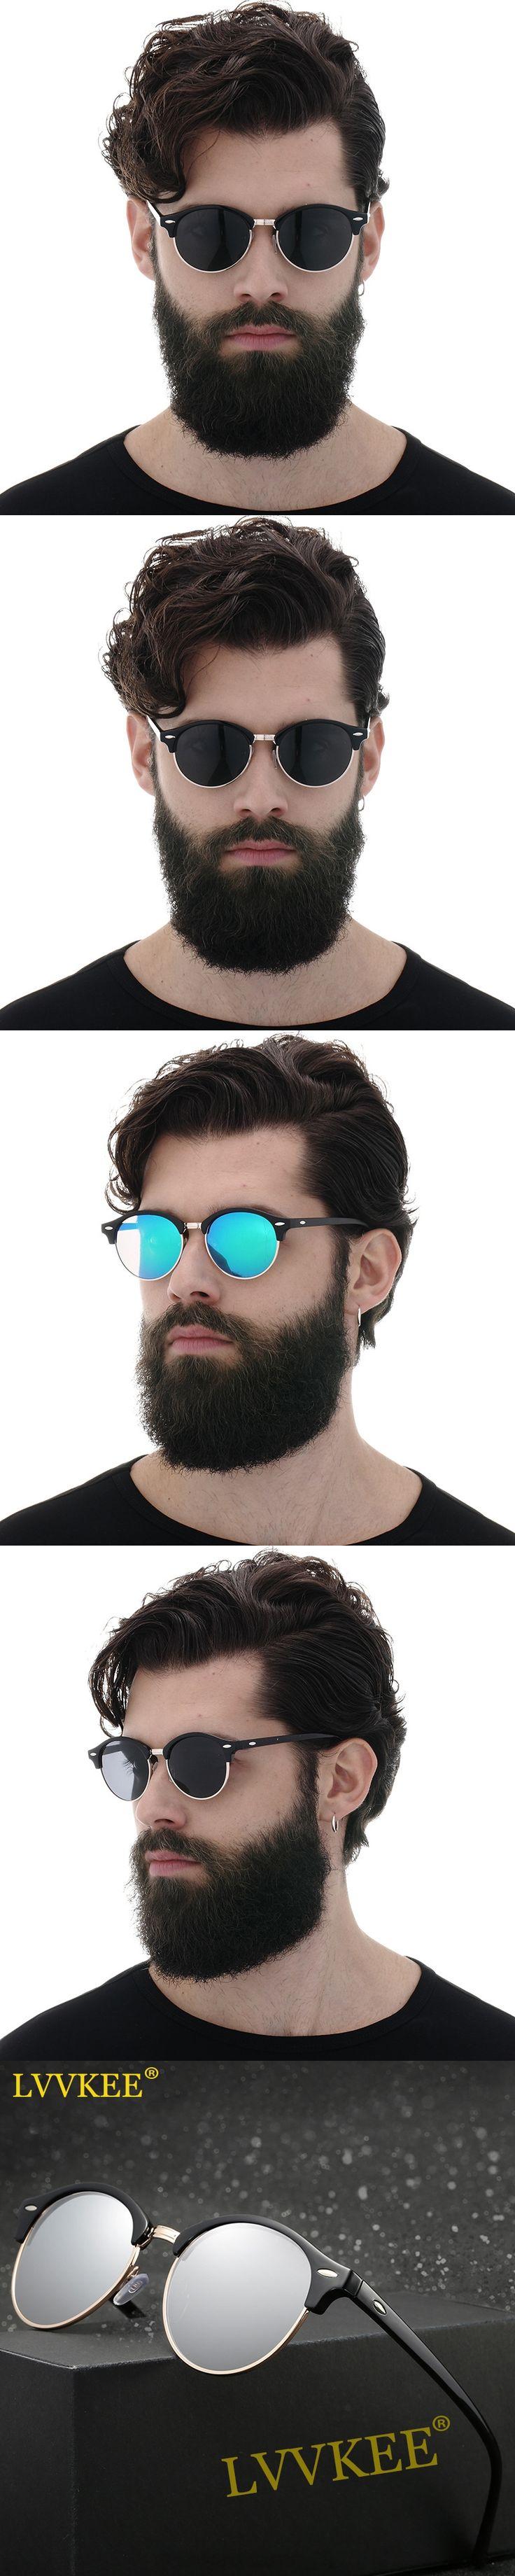 HOT 2017 The newest Polarized Round Sunglasses Women/Men Brand Designer Club Classic Sun glasses driving semi rimless glasses